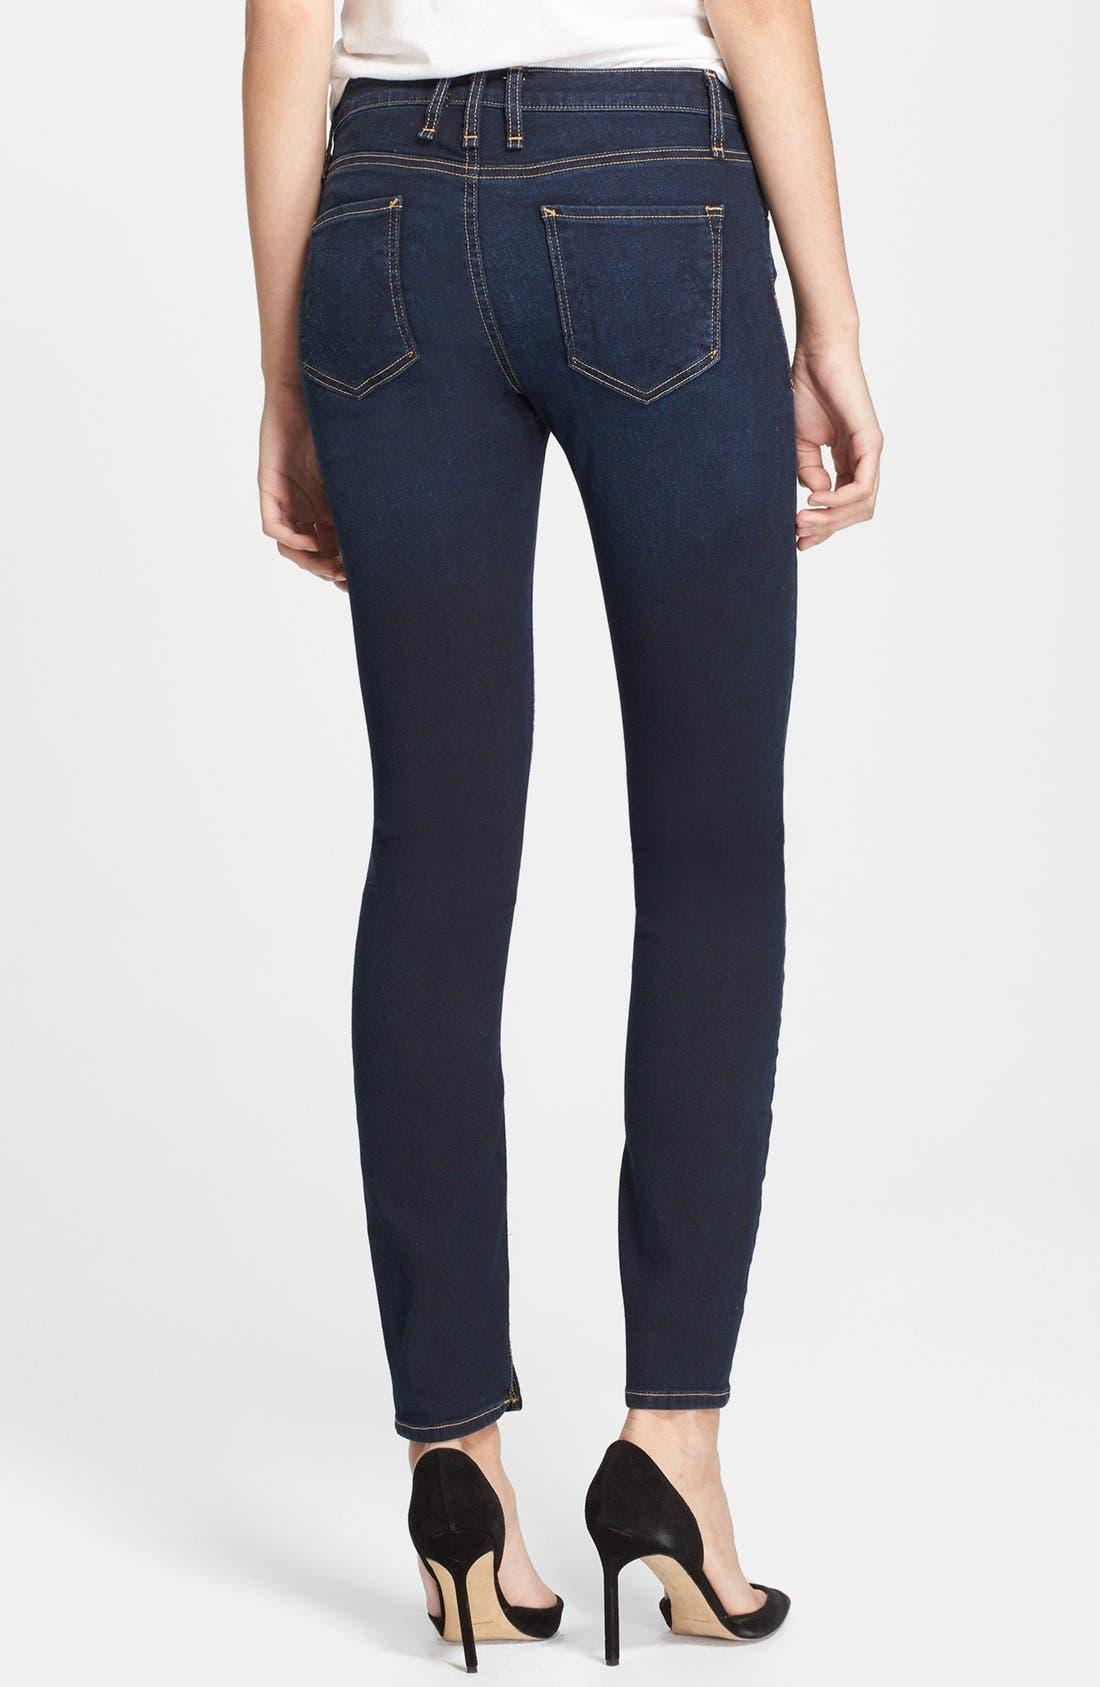 Alternate Image 2  - McGuire Skinny Ankle Jeans (Atlantic Blue)